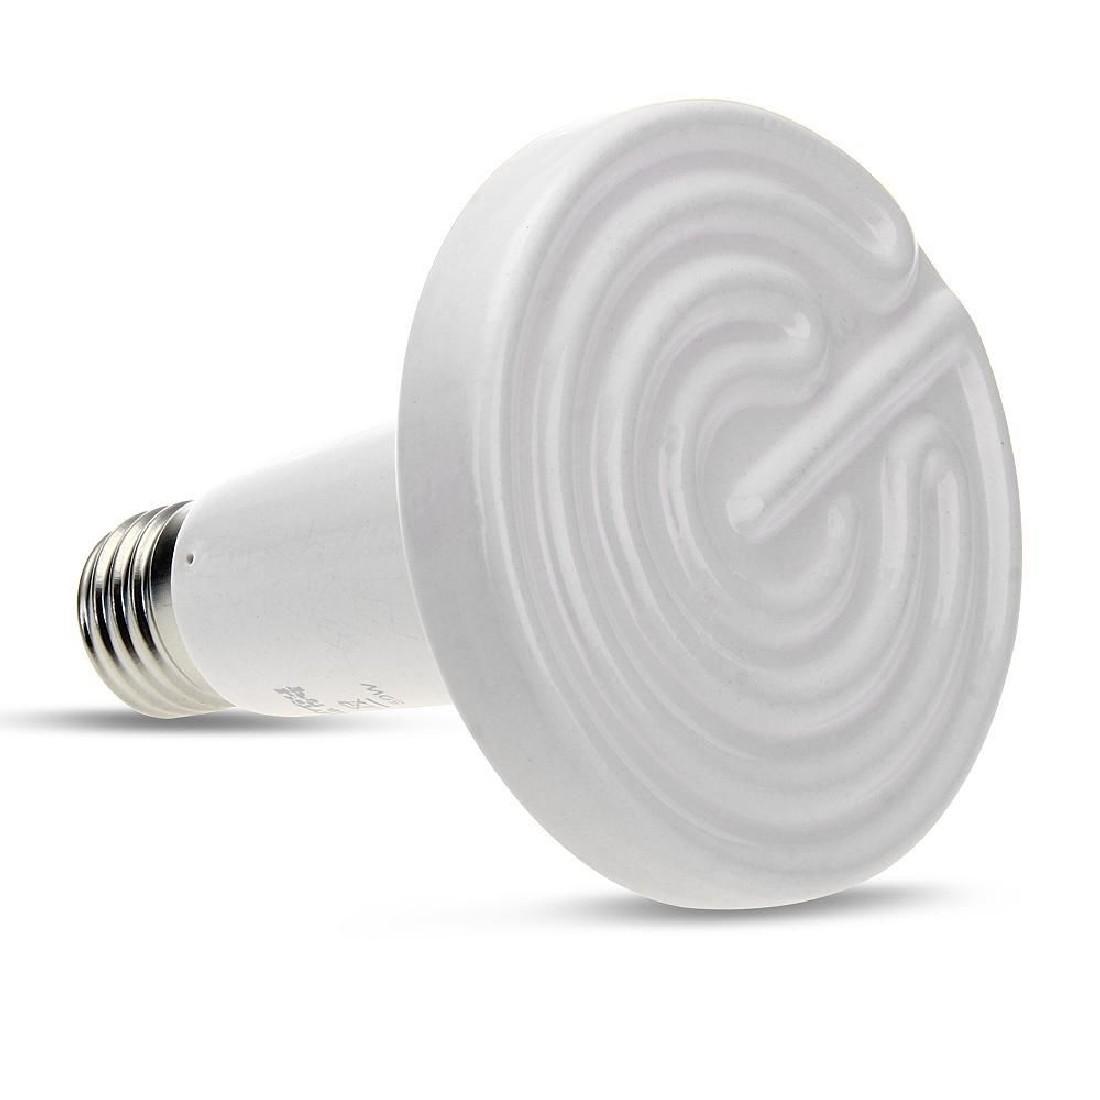 New Free Shipping 75W 220V Ceramic Heat Emitter Brooder Infared Lamp Bulb Reptile Grow(China (Mainland))